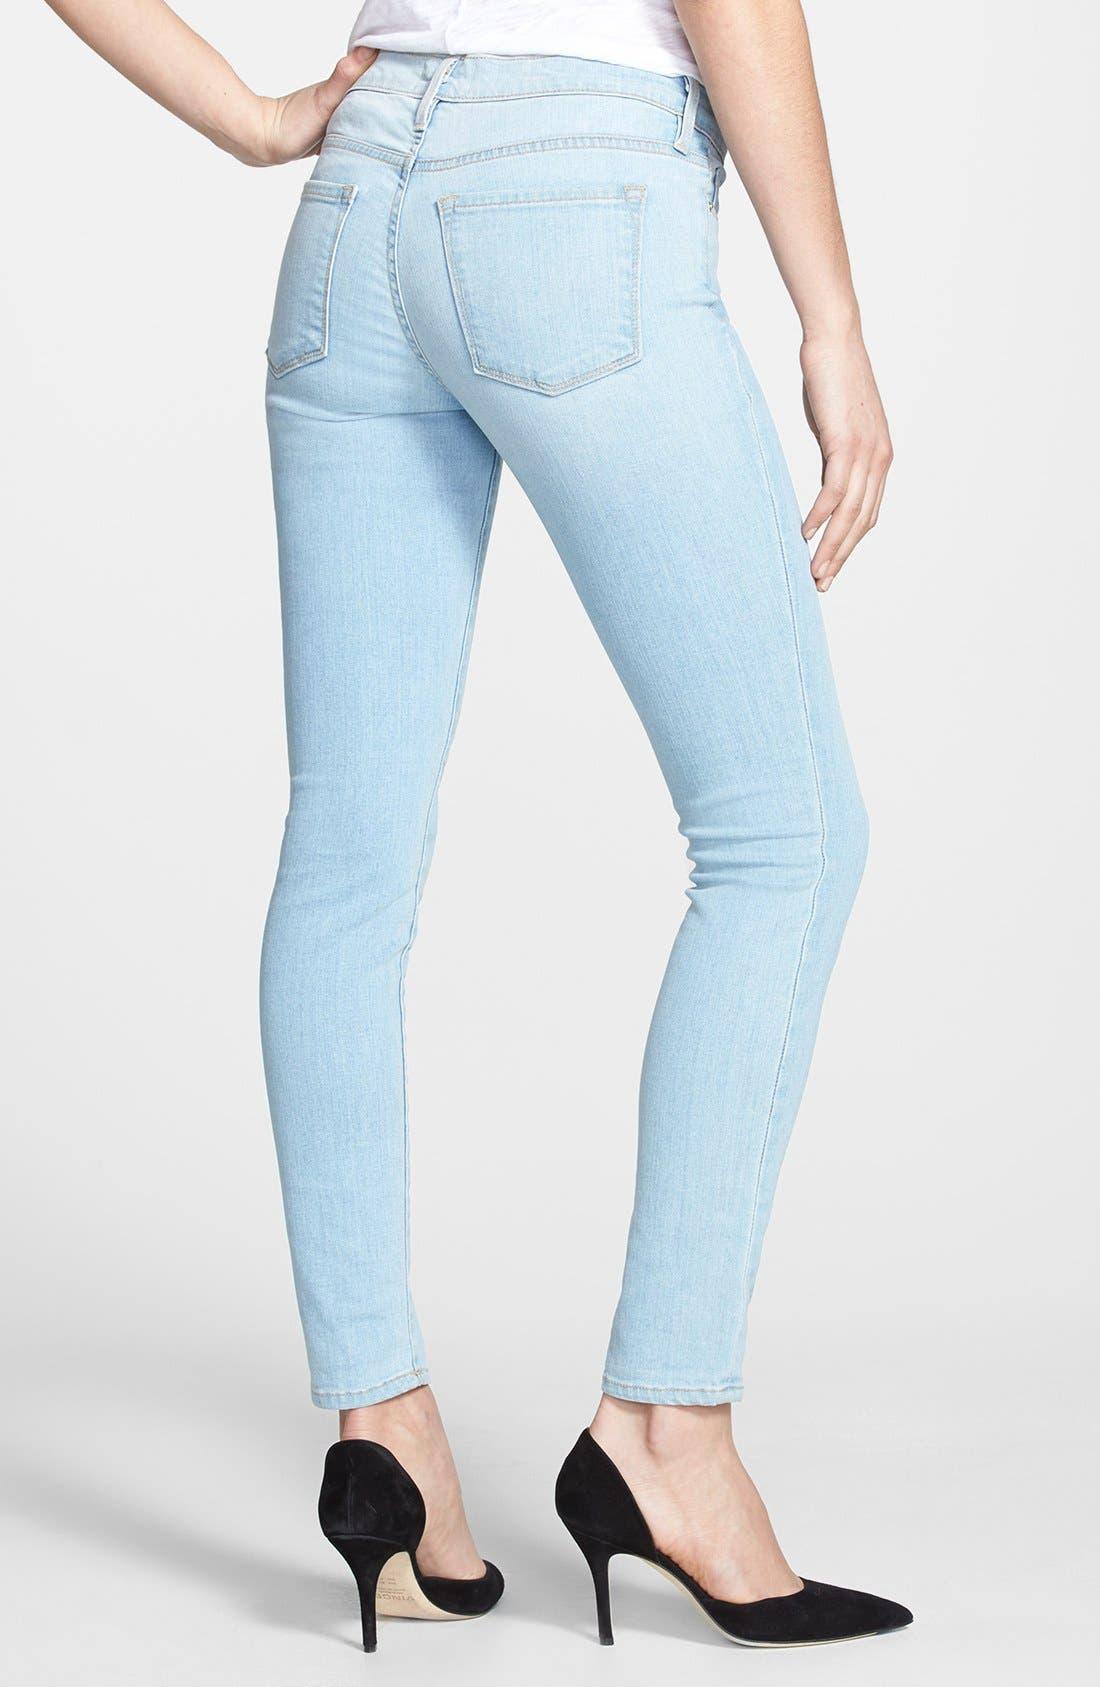 Alternate Image 2  - Frame Denim 'Le Skinny de Jeanne' Jeans (Redchurch Street)